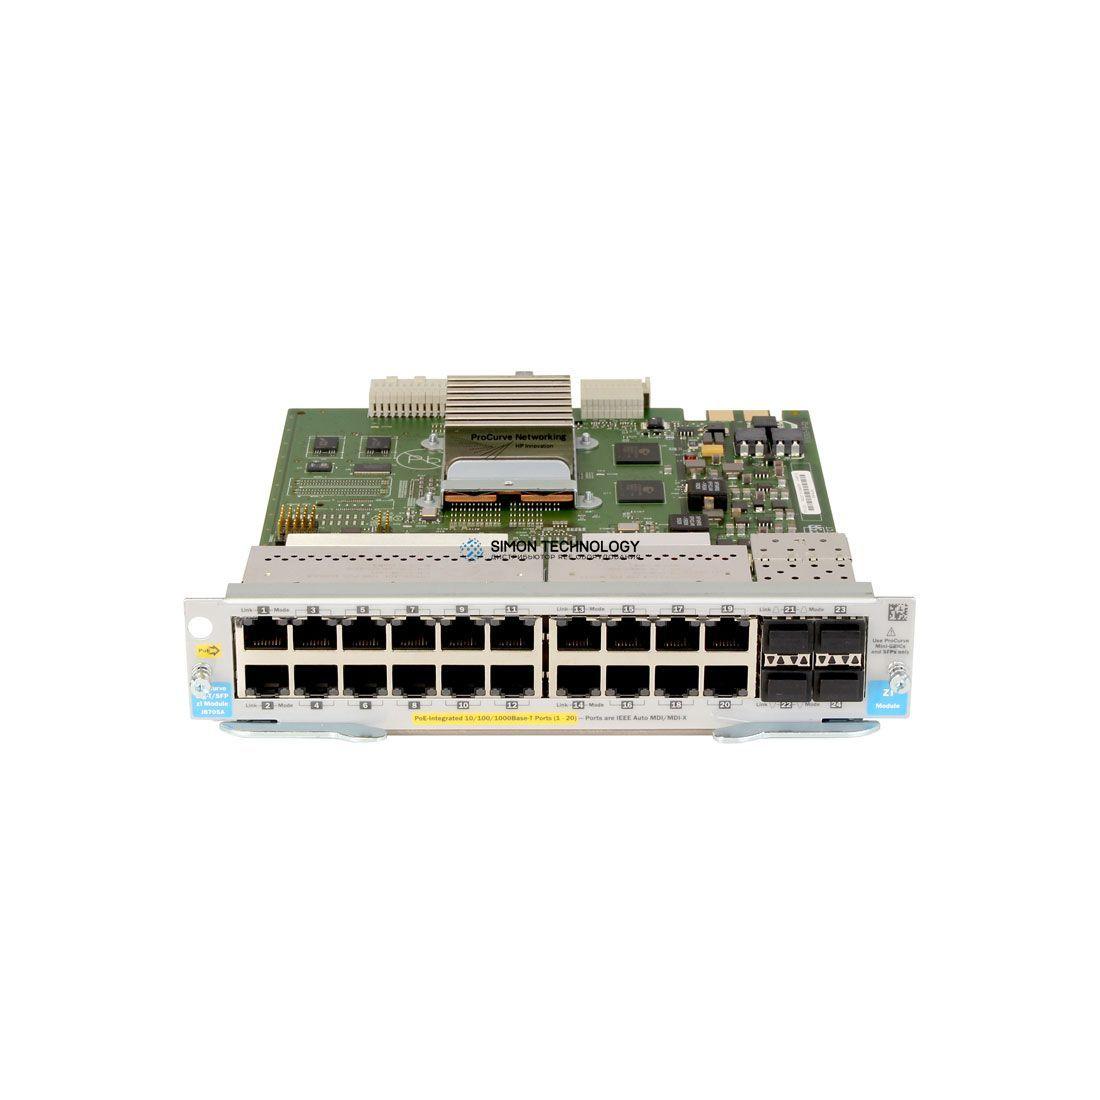 Модуль HP HPE 20p 10/100/1000 PoE+/4p MGBIC zl Mod (J9308-69001)